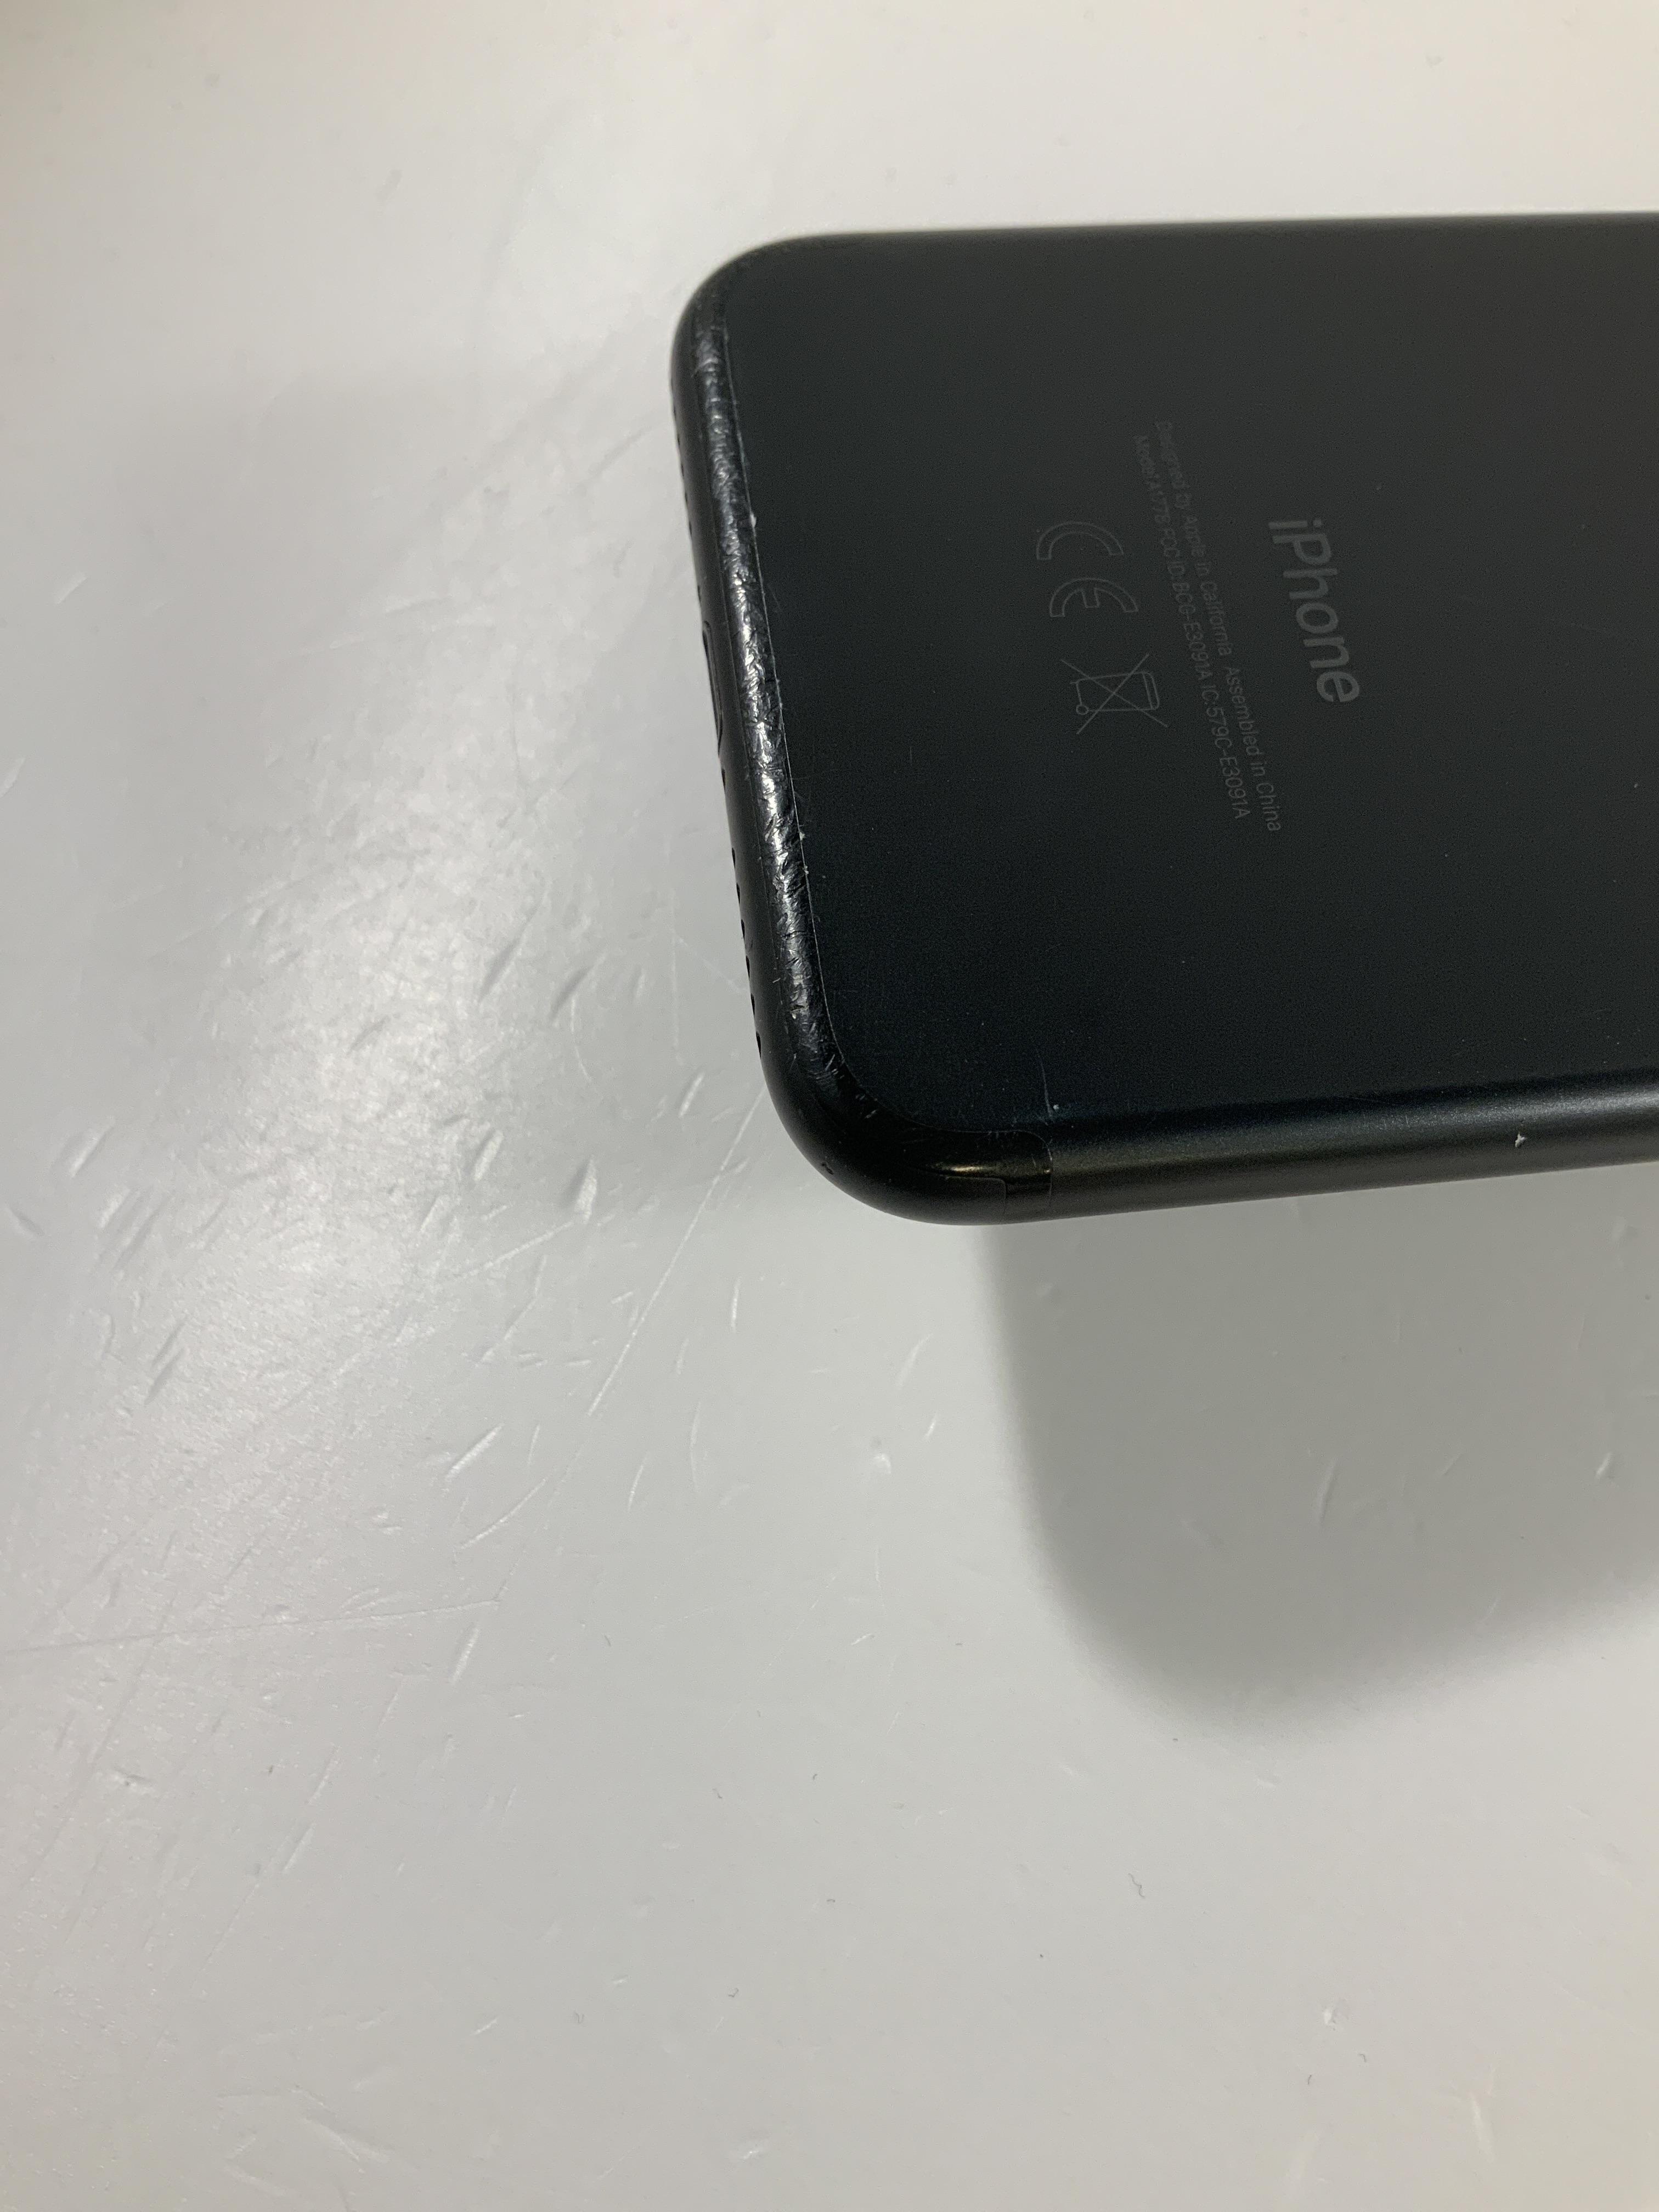 iPhone 7 32GB, 32GB, Black, Bild 5